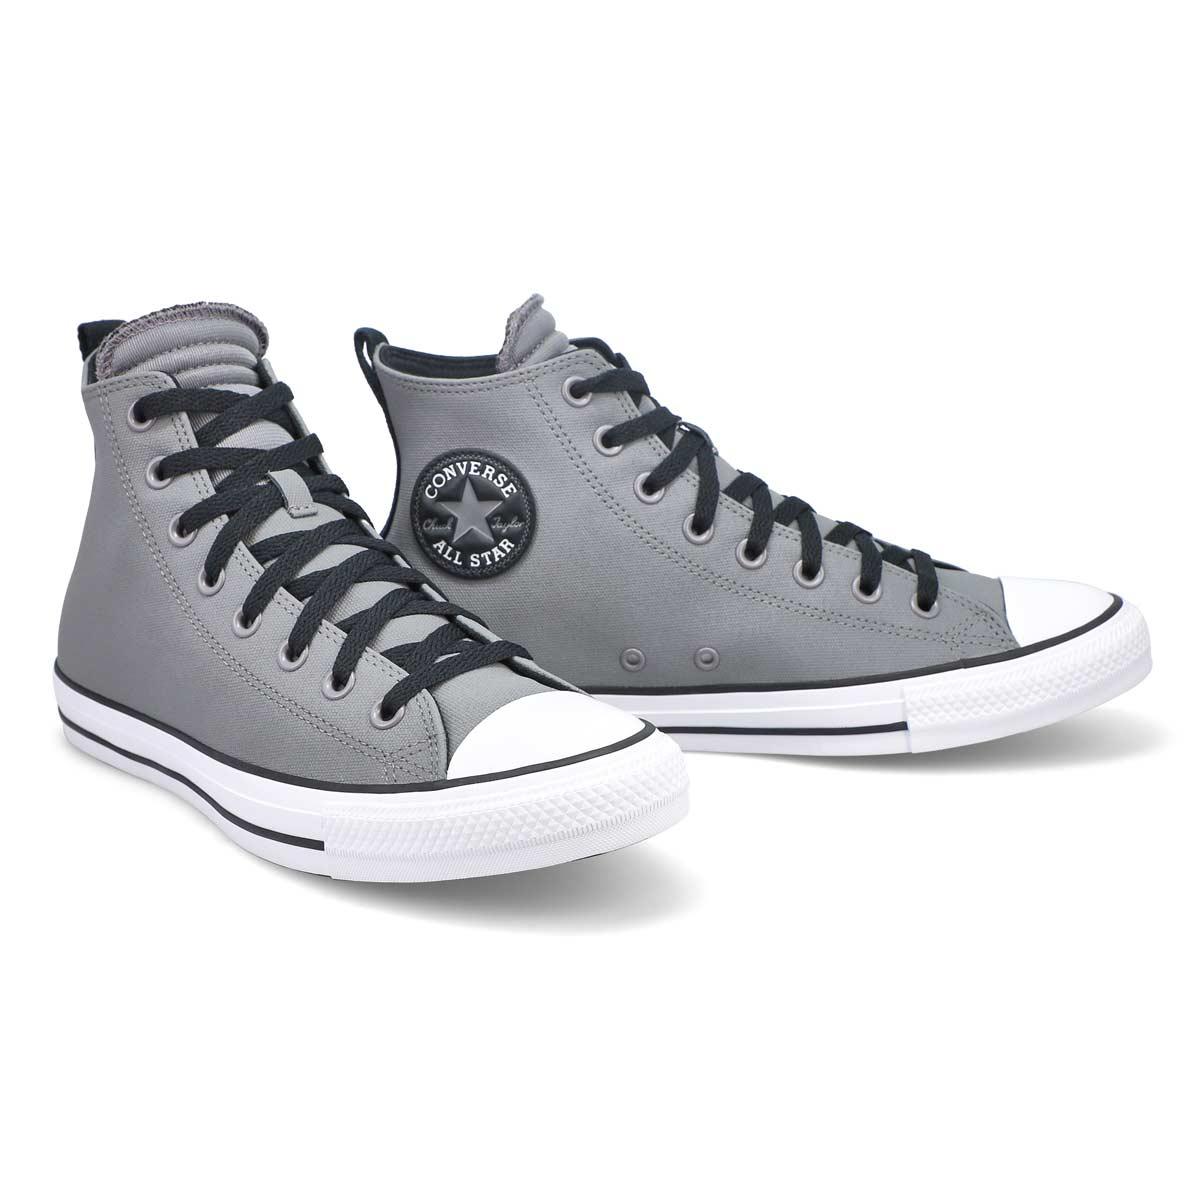 Men's All Star Hi Top Sneaker - Mason/Black/White